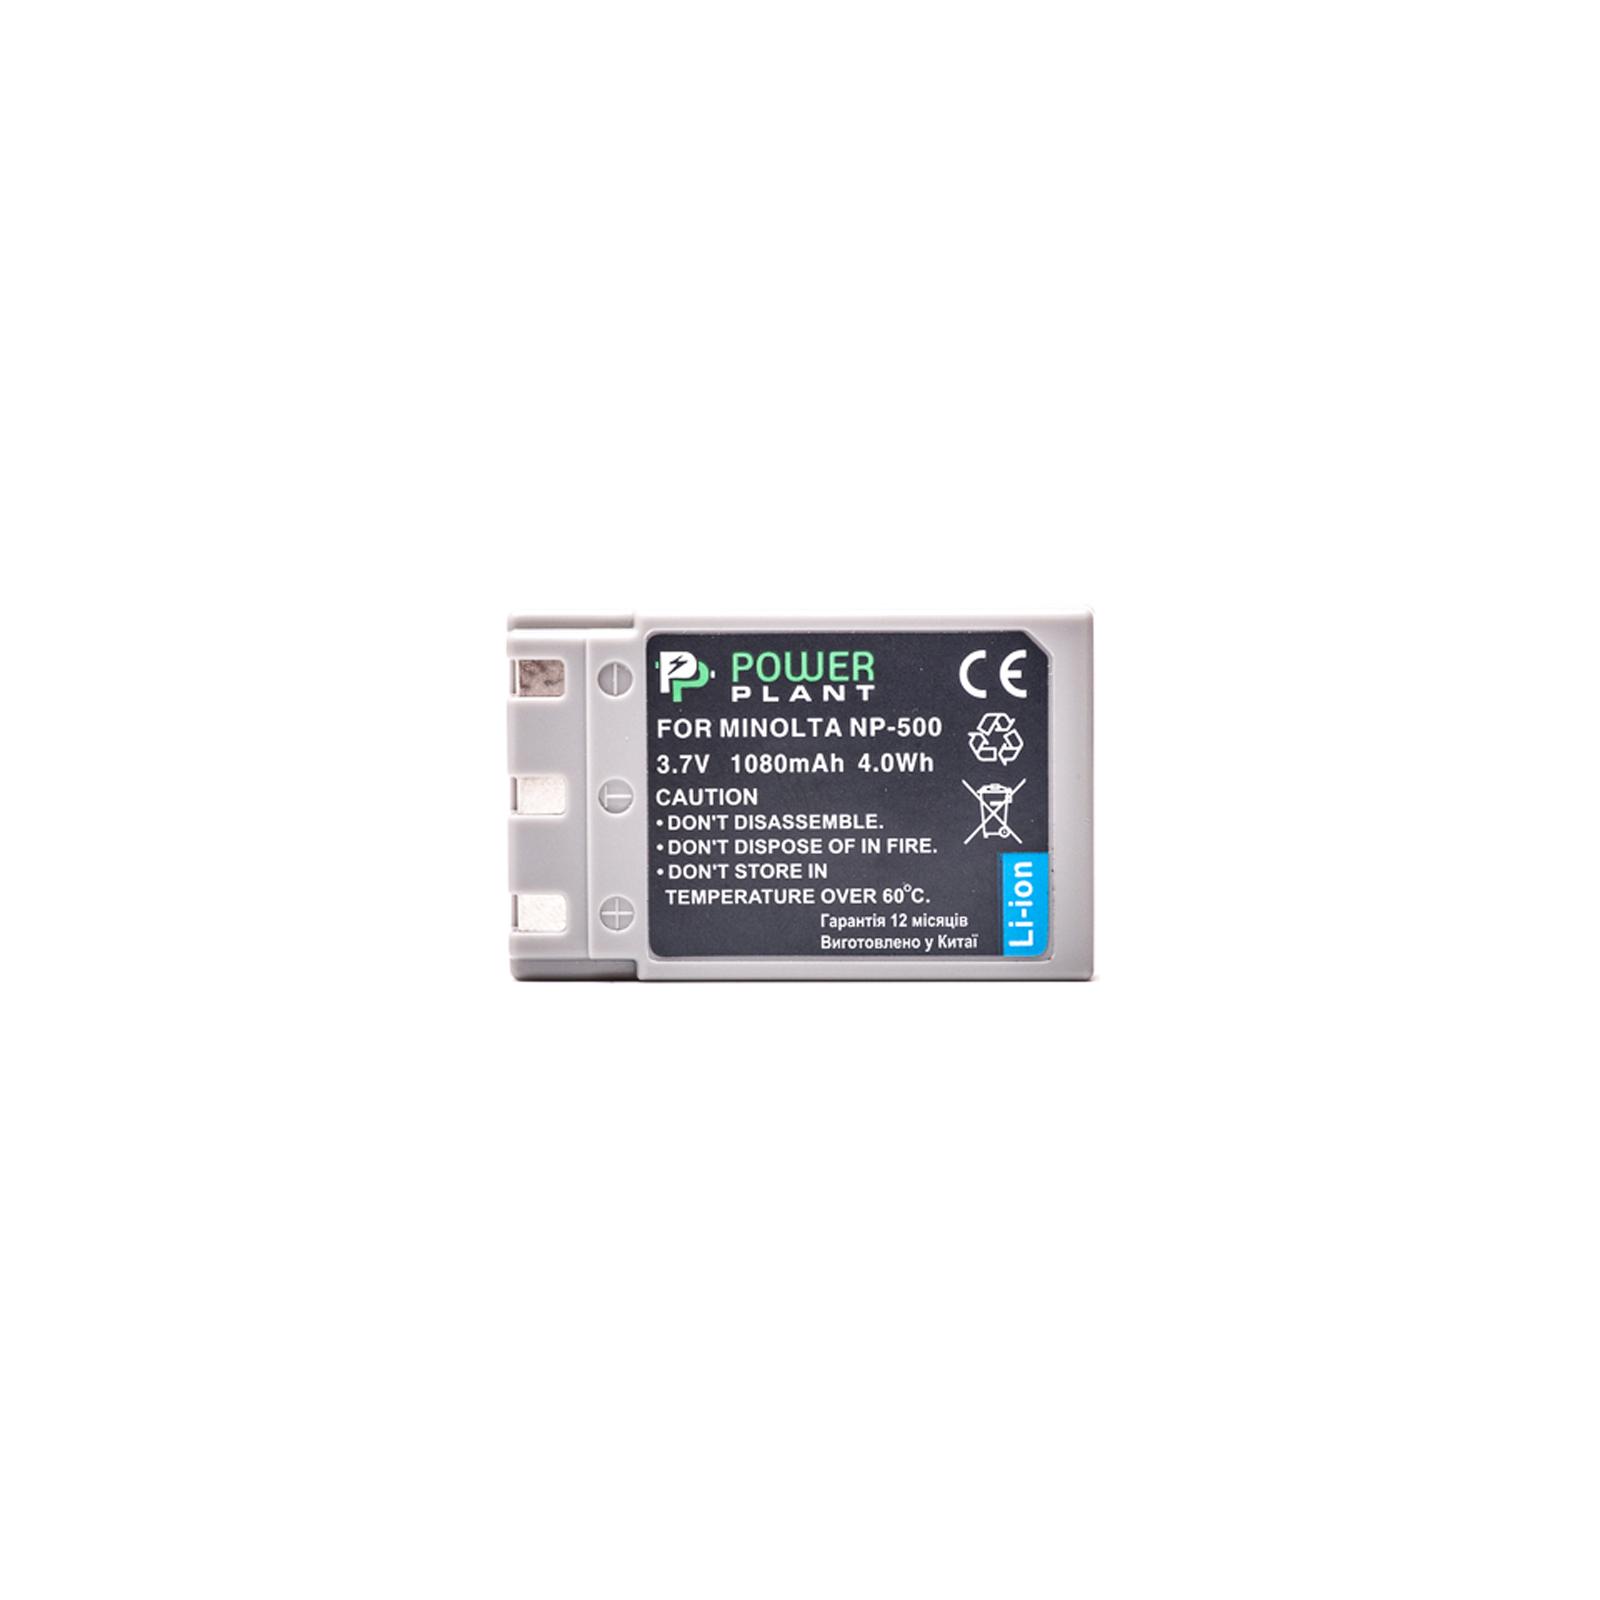 Аккумулятор к фото/видео PowerPlant Minolta NP-500, NP-600 (DV00DV1054) изображение 2